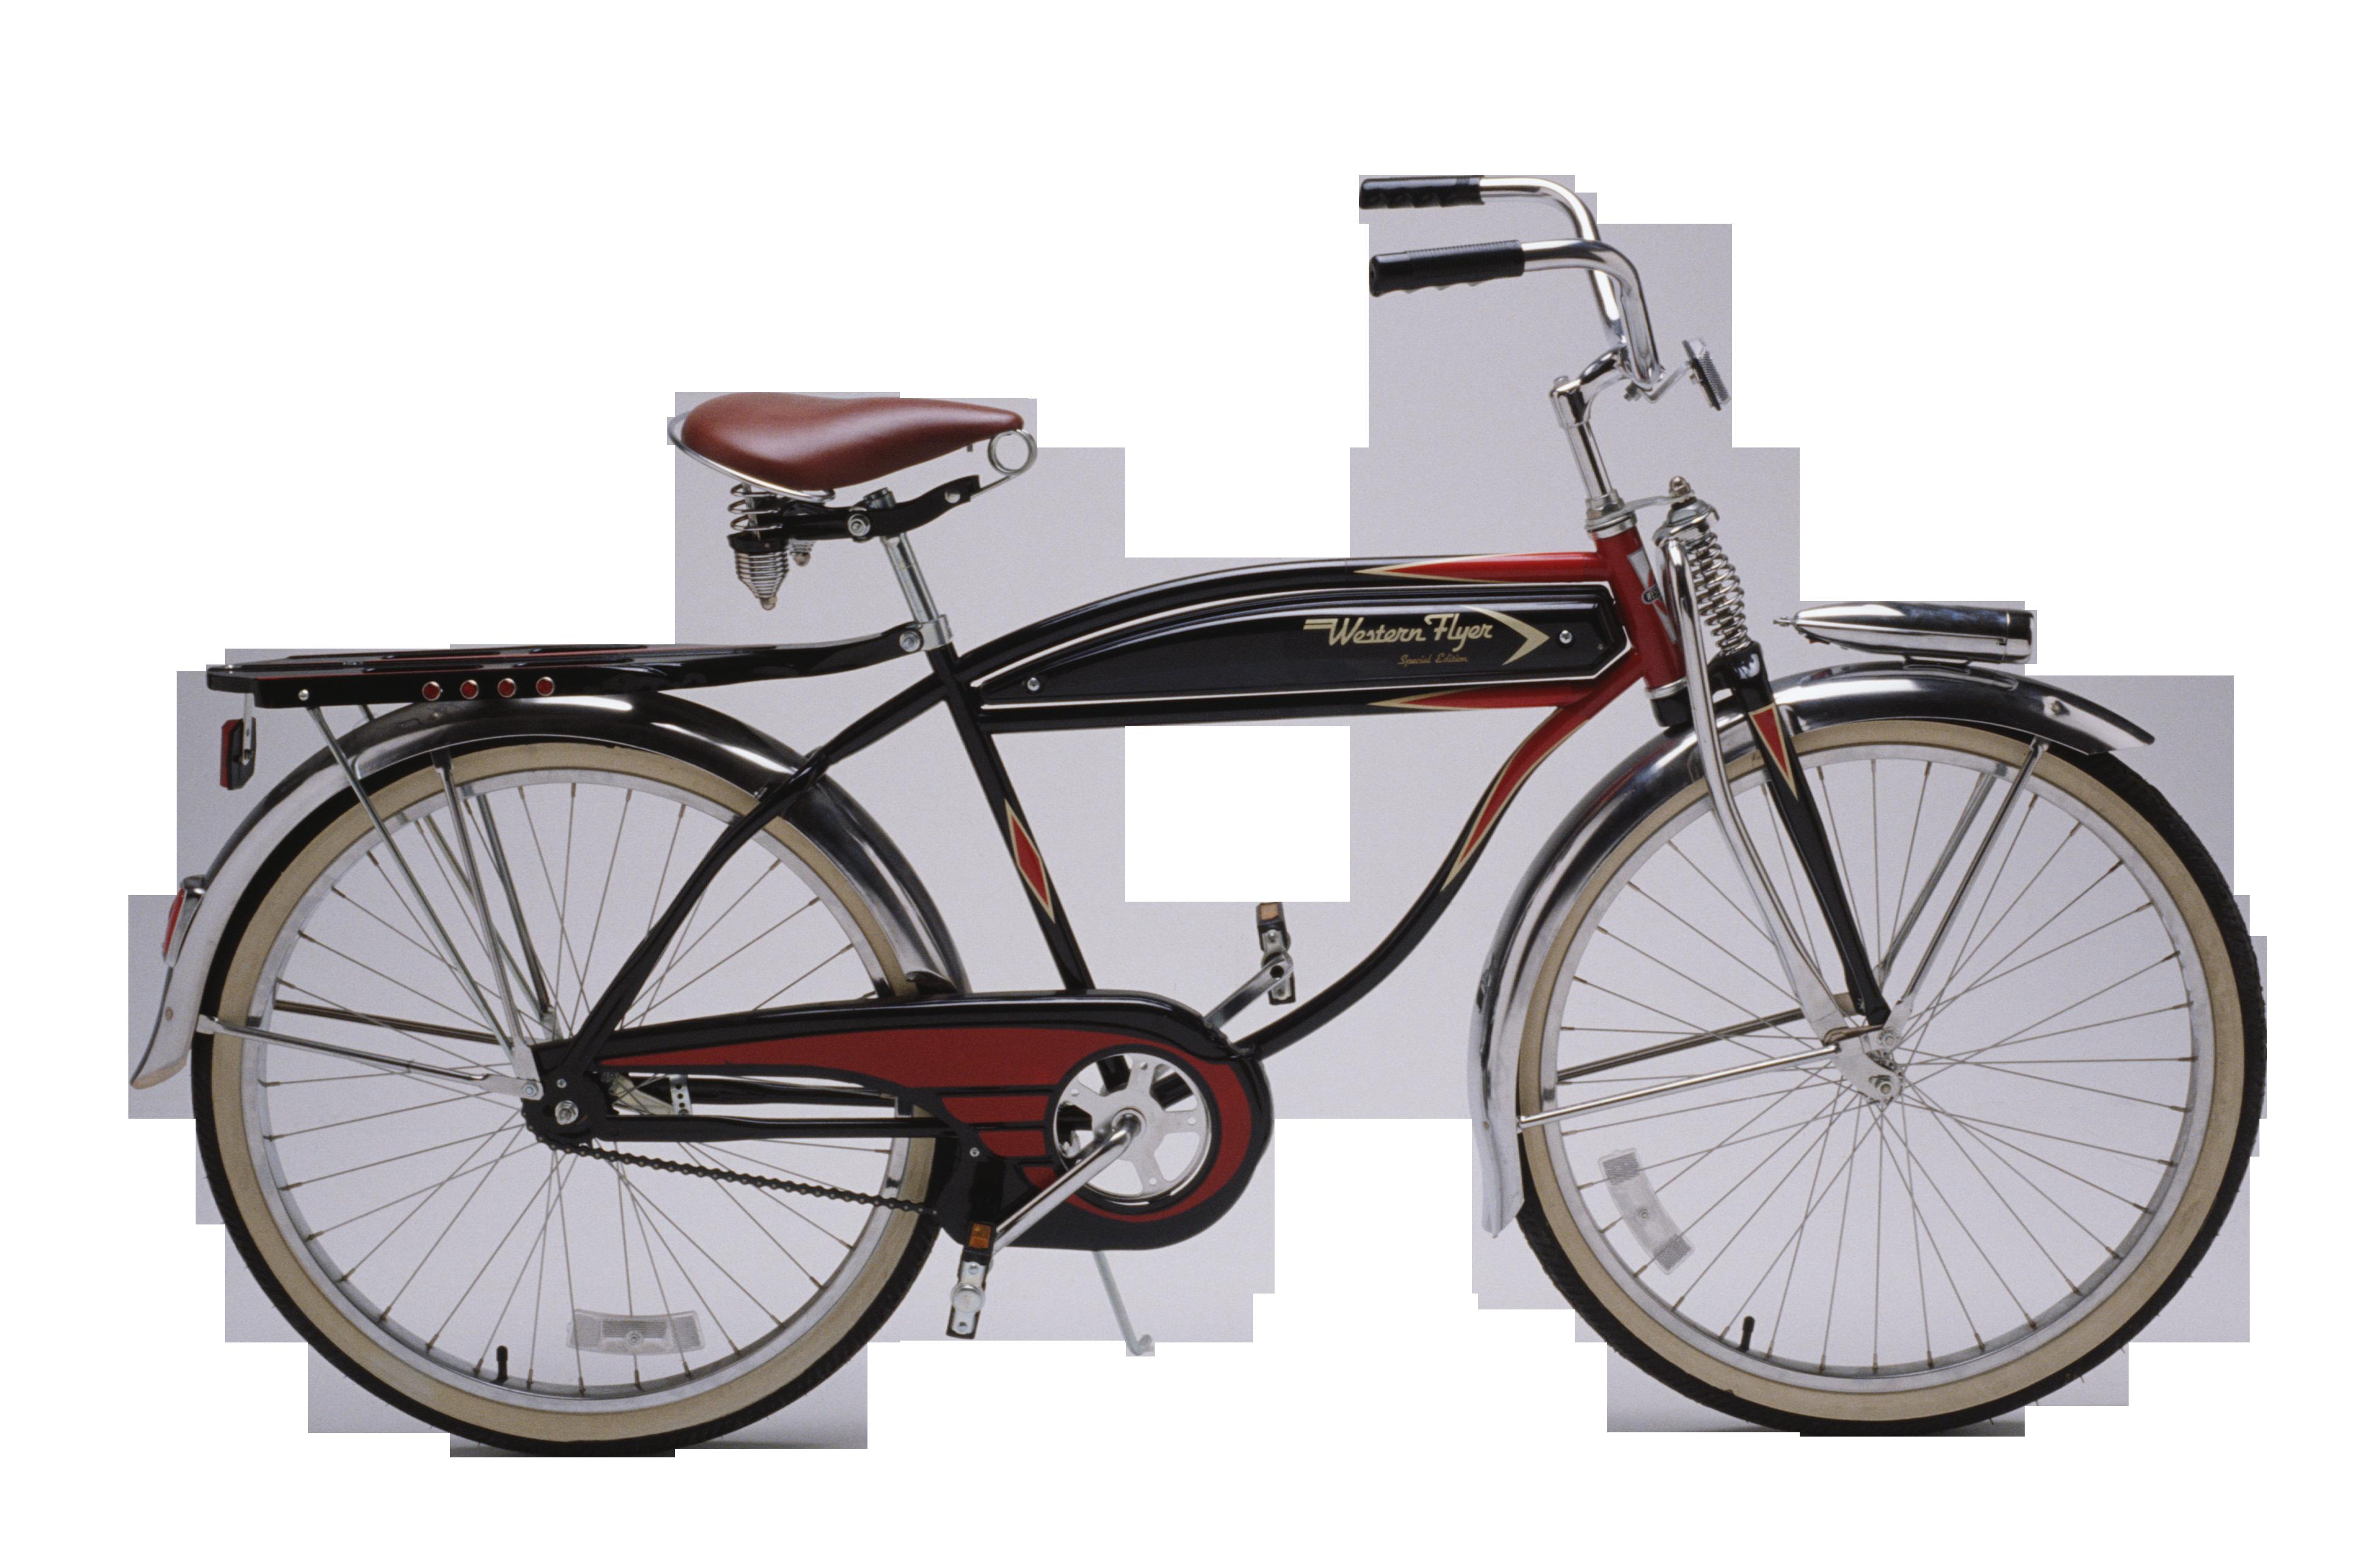 Vintage Bike png by AbsurdWordPreferred.deviantart pluspng.com on @deviantART - Bicycle PNG